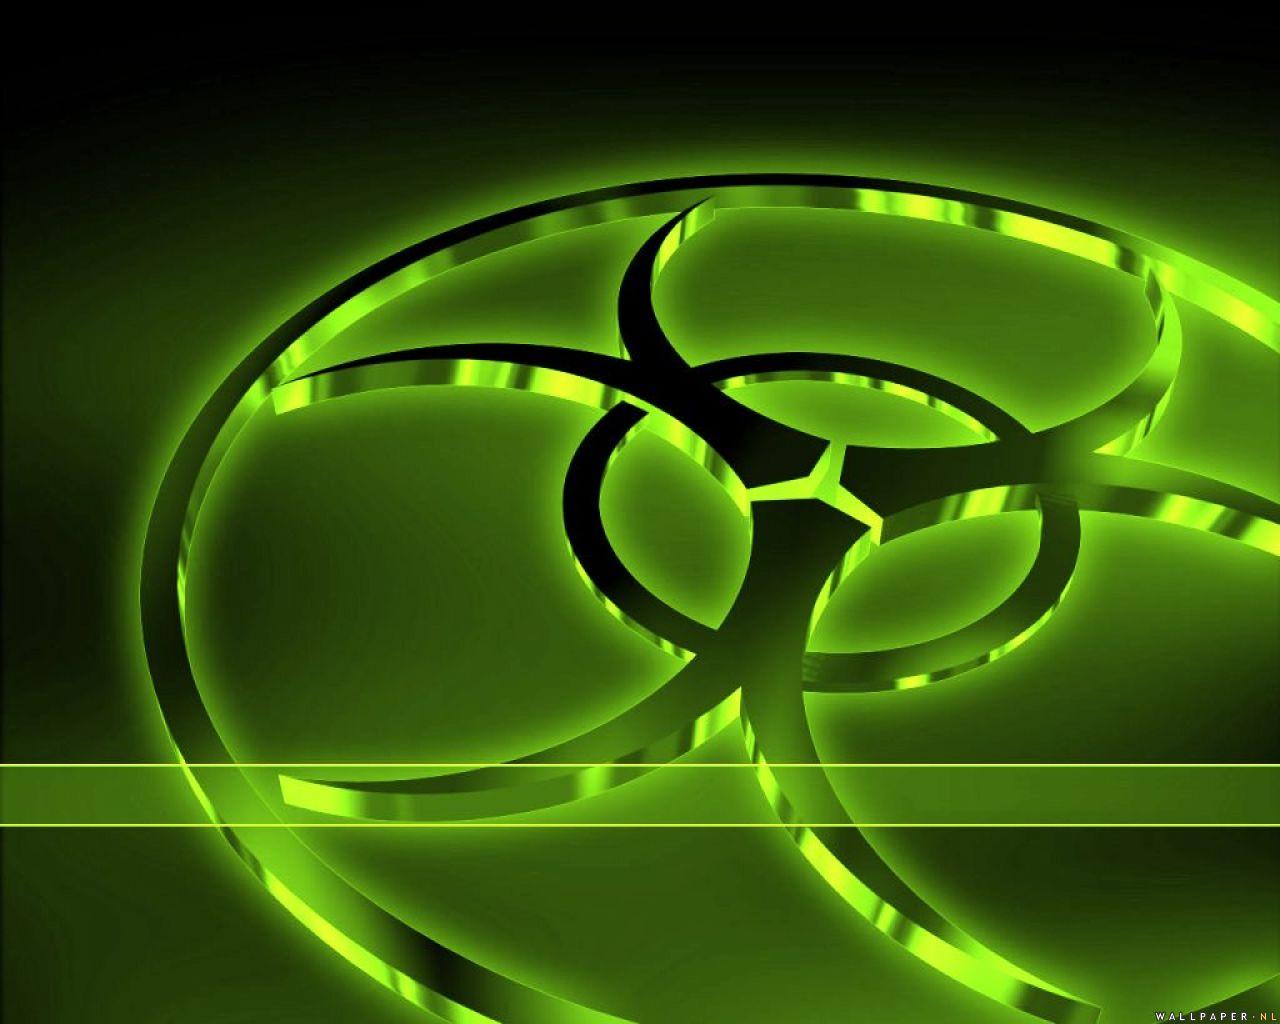 http://2.bp.blogspot.com/--Rbb7o5p9fA/T9xvEkg3YOI/AAAAAAAAAsY/hYbOZ3C64Oo/s1600/is_uranium_biohazard_neongreen_bio_back_forfew_more_desktop_1280x1024_wallpaper.jpg